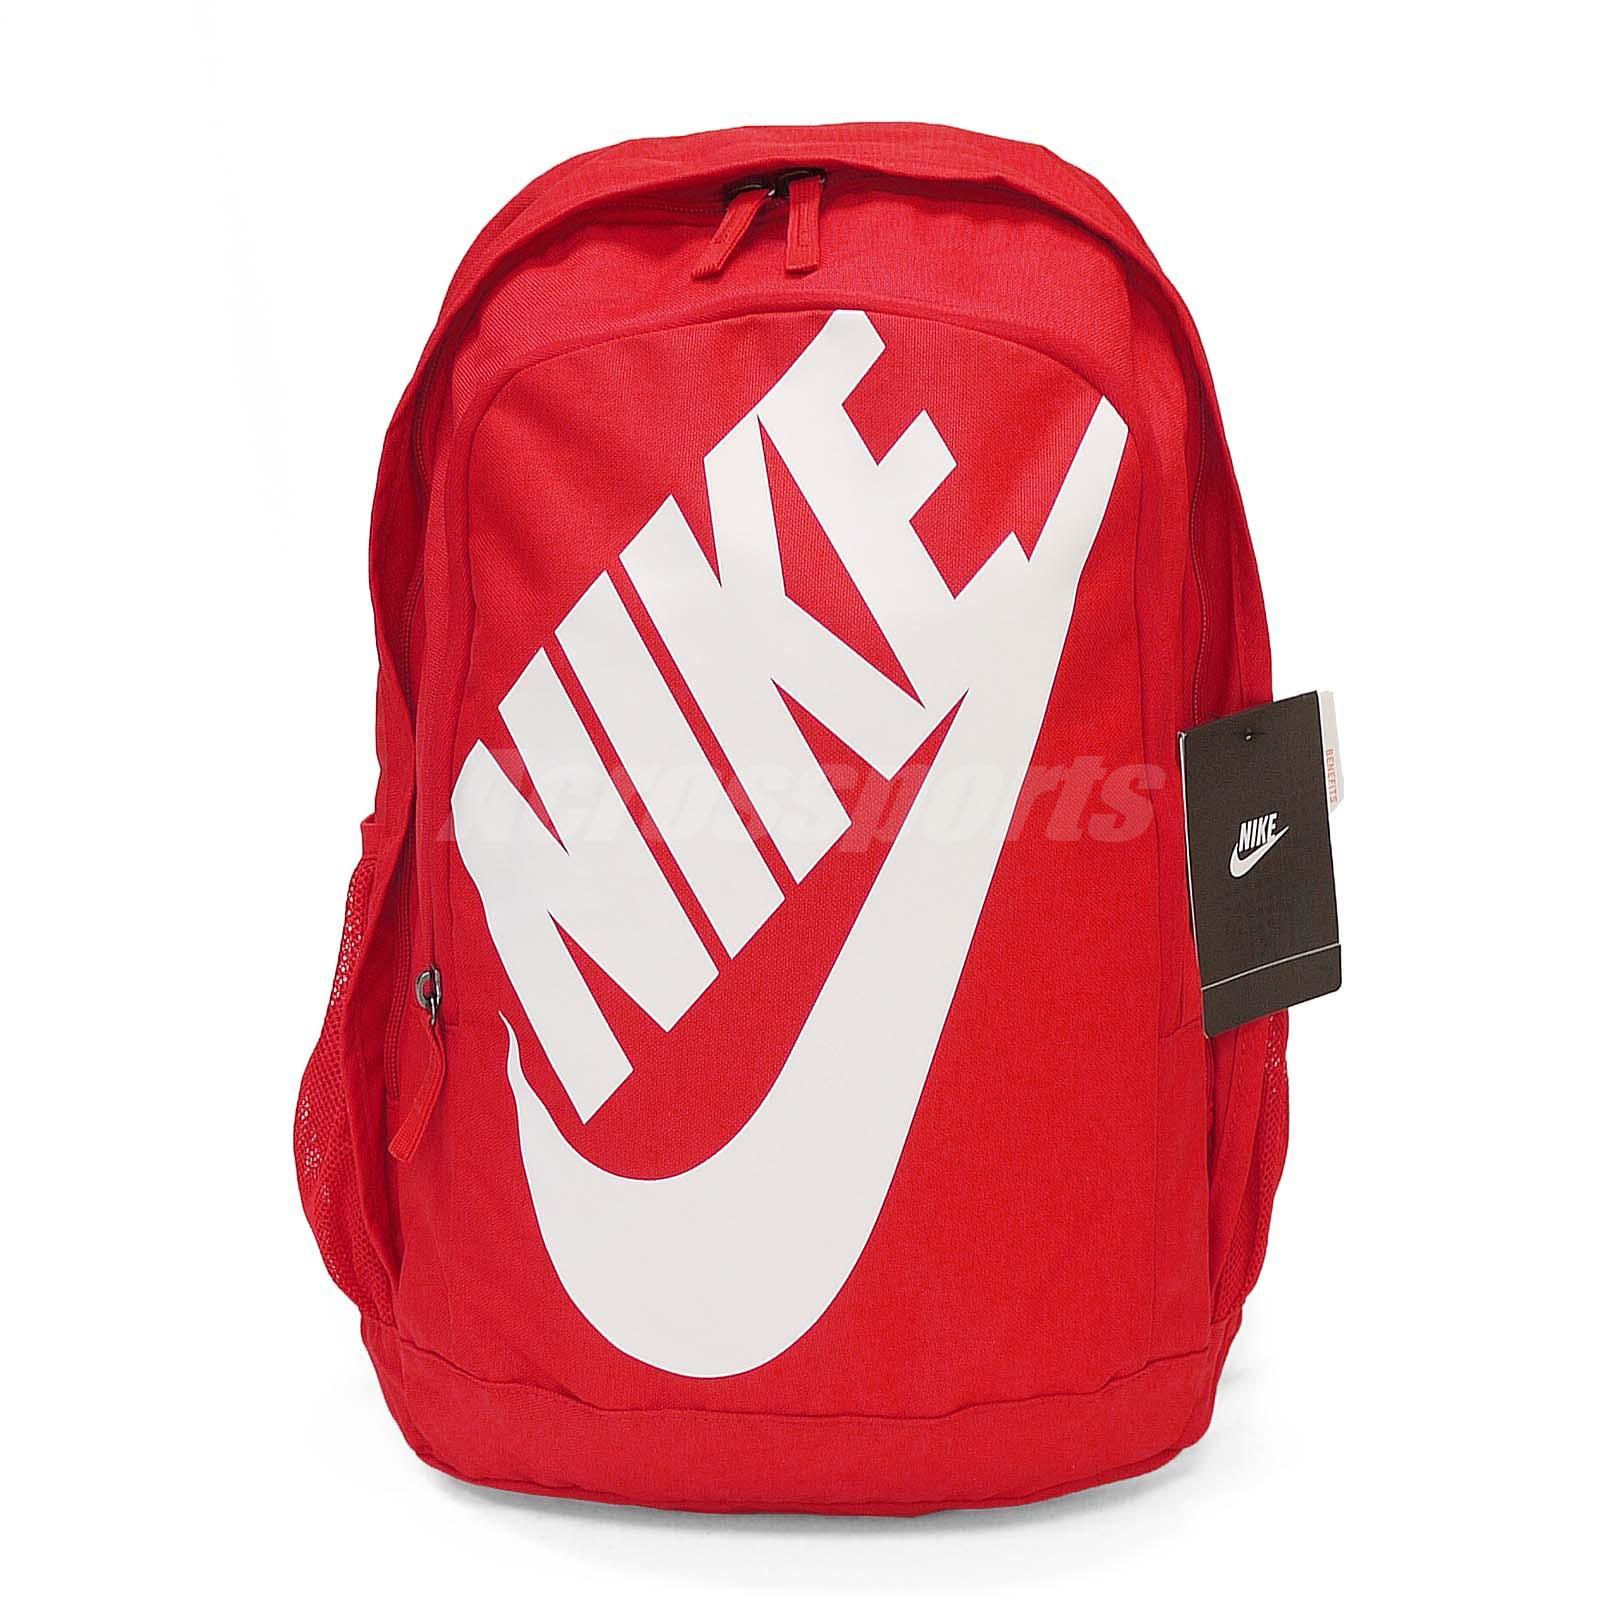 877e88f2f91f Nike Sportswear Hayward Futura M 2.0 Red White Unisex Backpack Bag ...